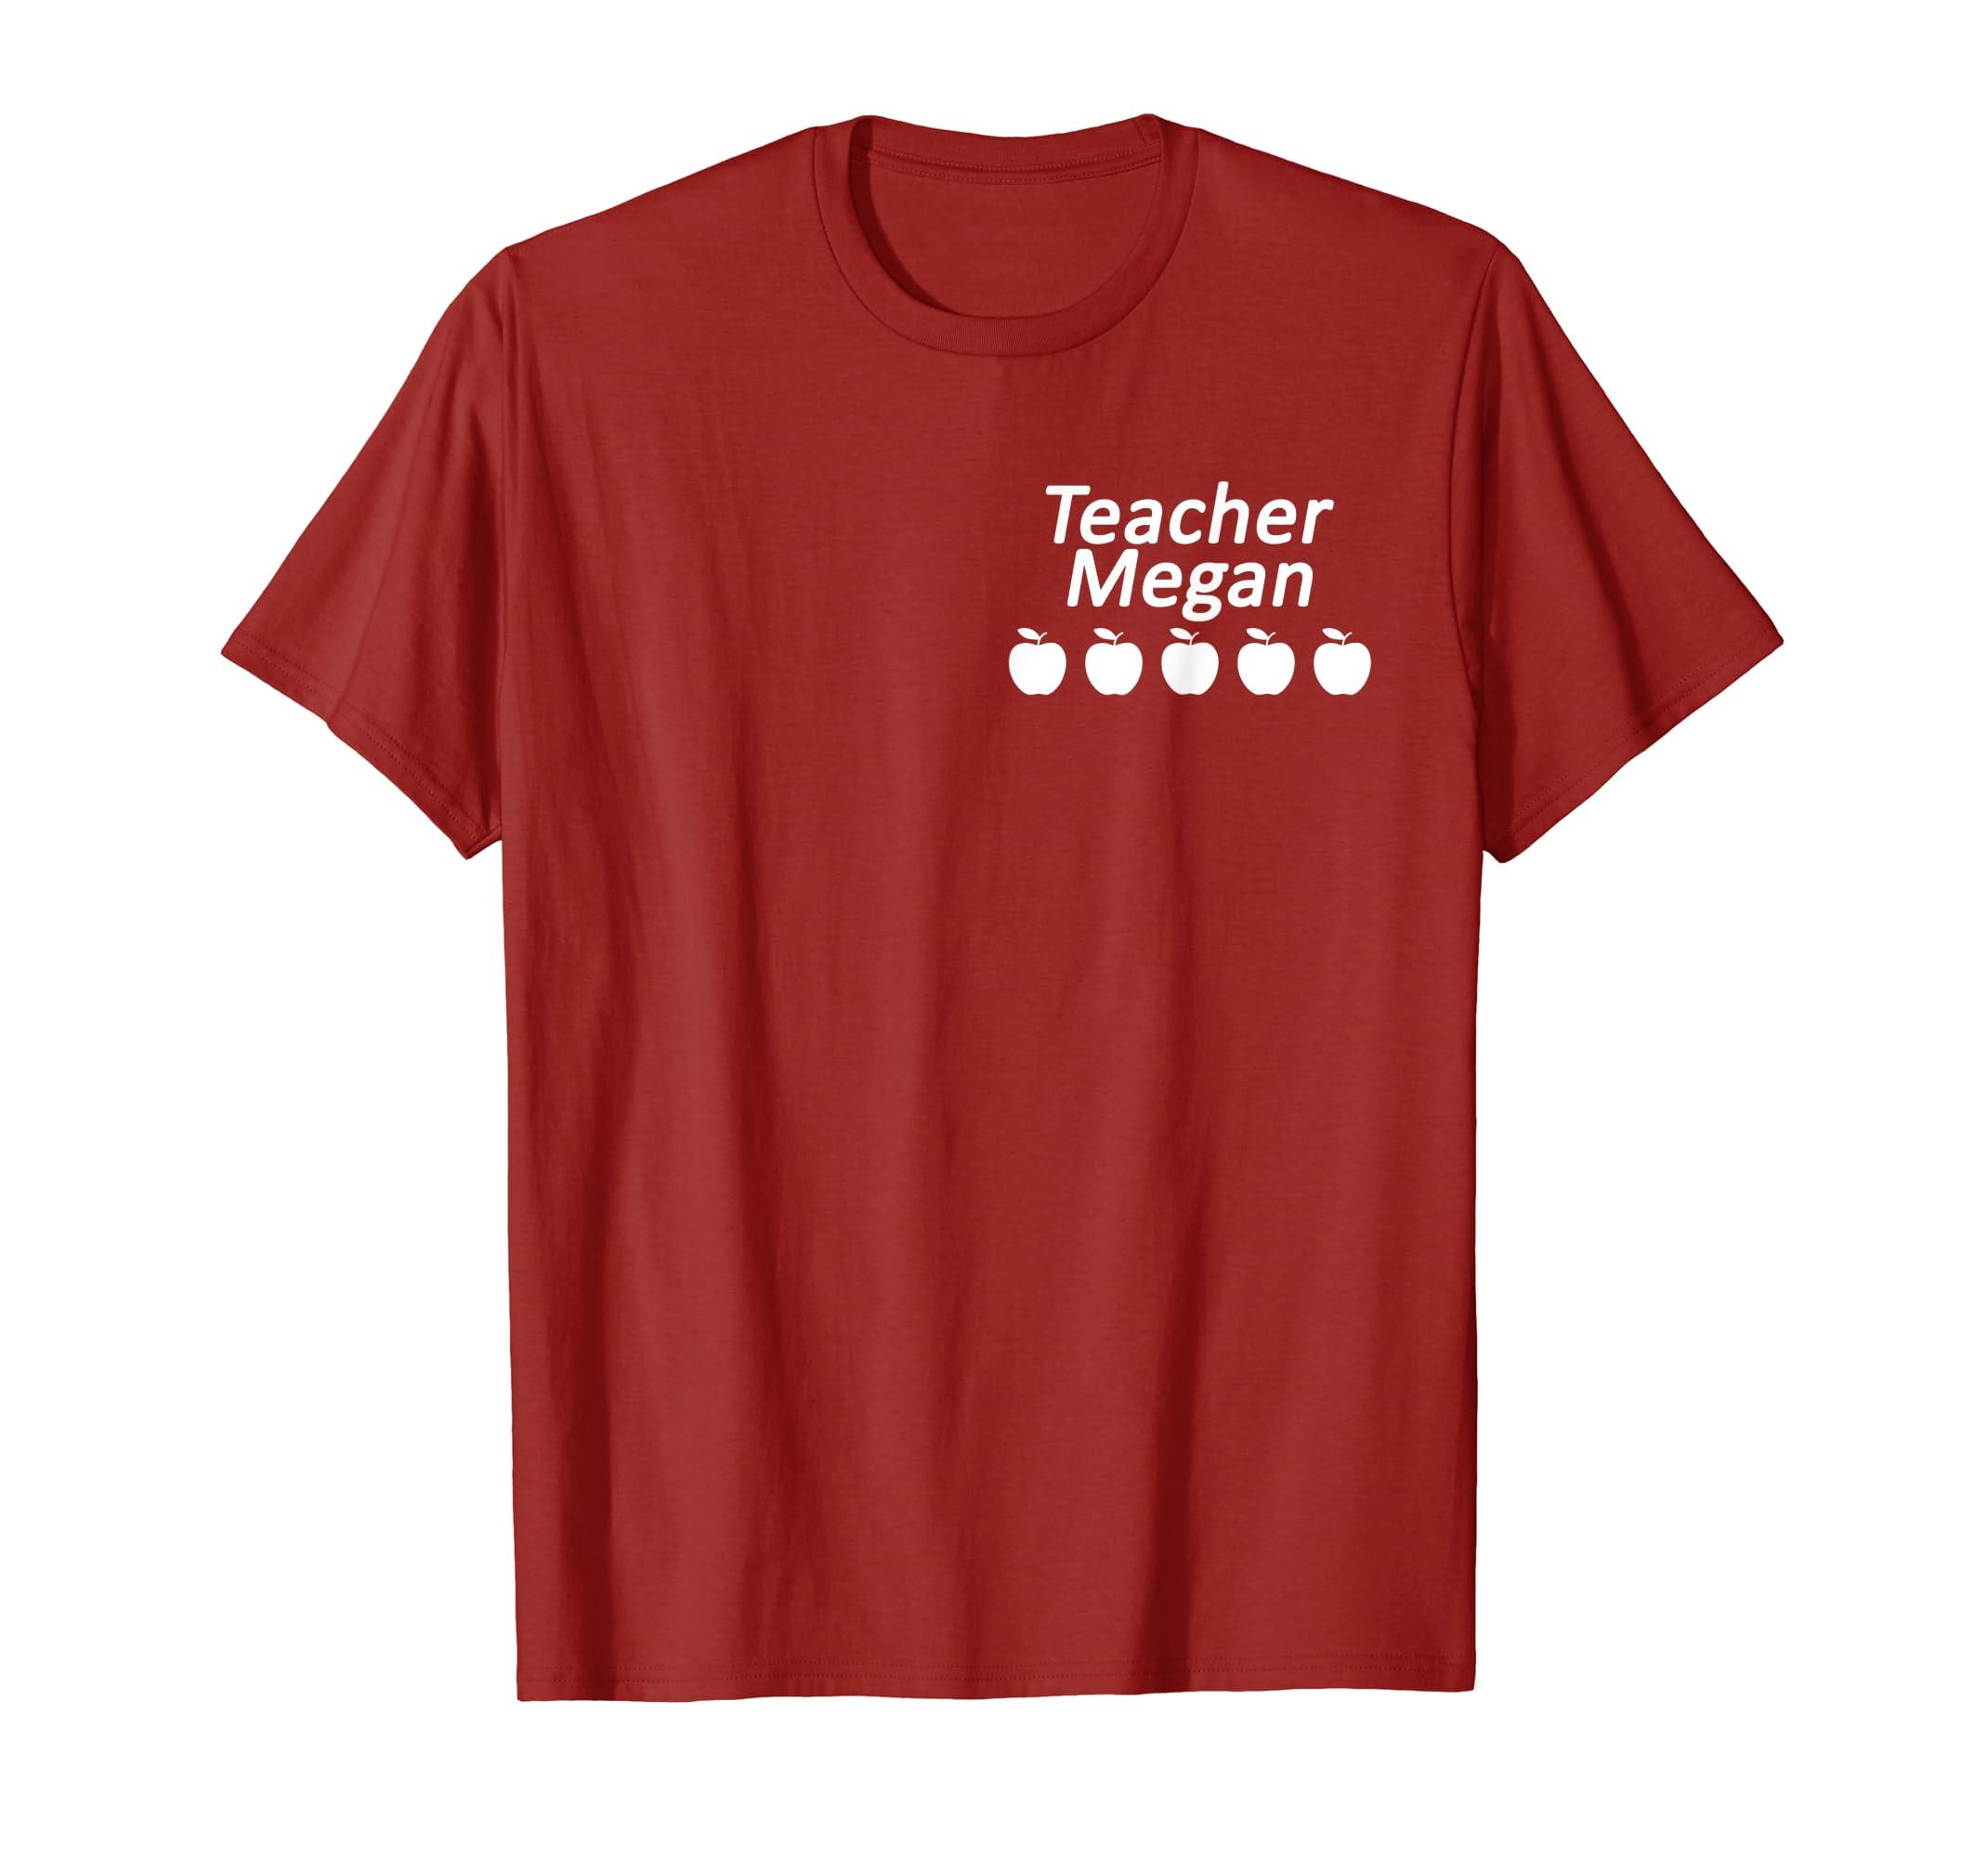 0d1215a3 Amazon.com: VIPKid Teacher Megan Five Apples T-shirt: Clothing